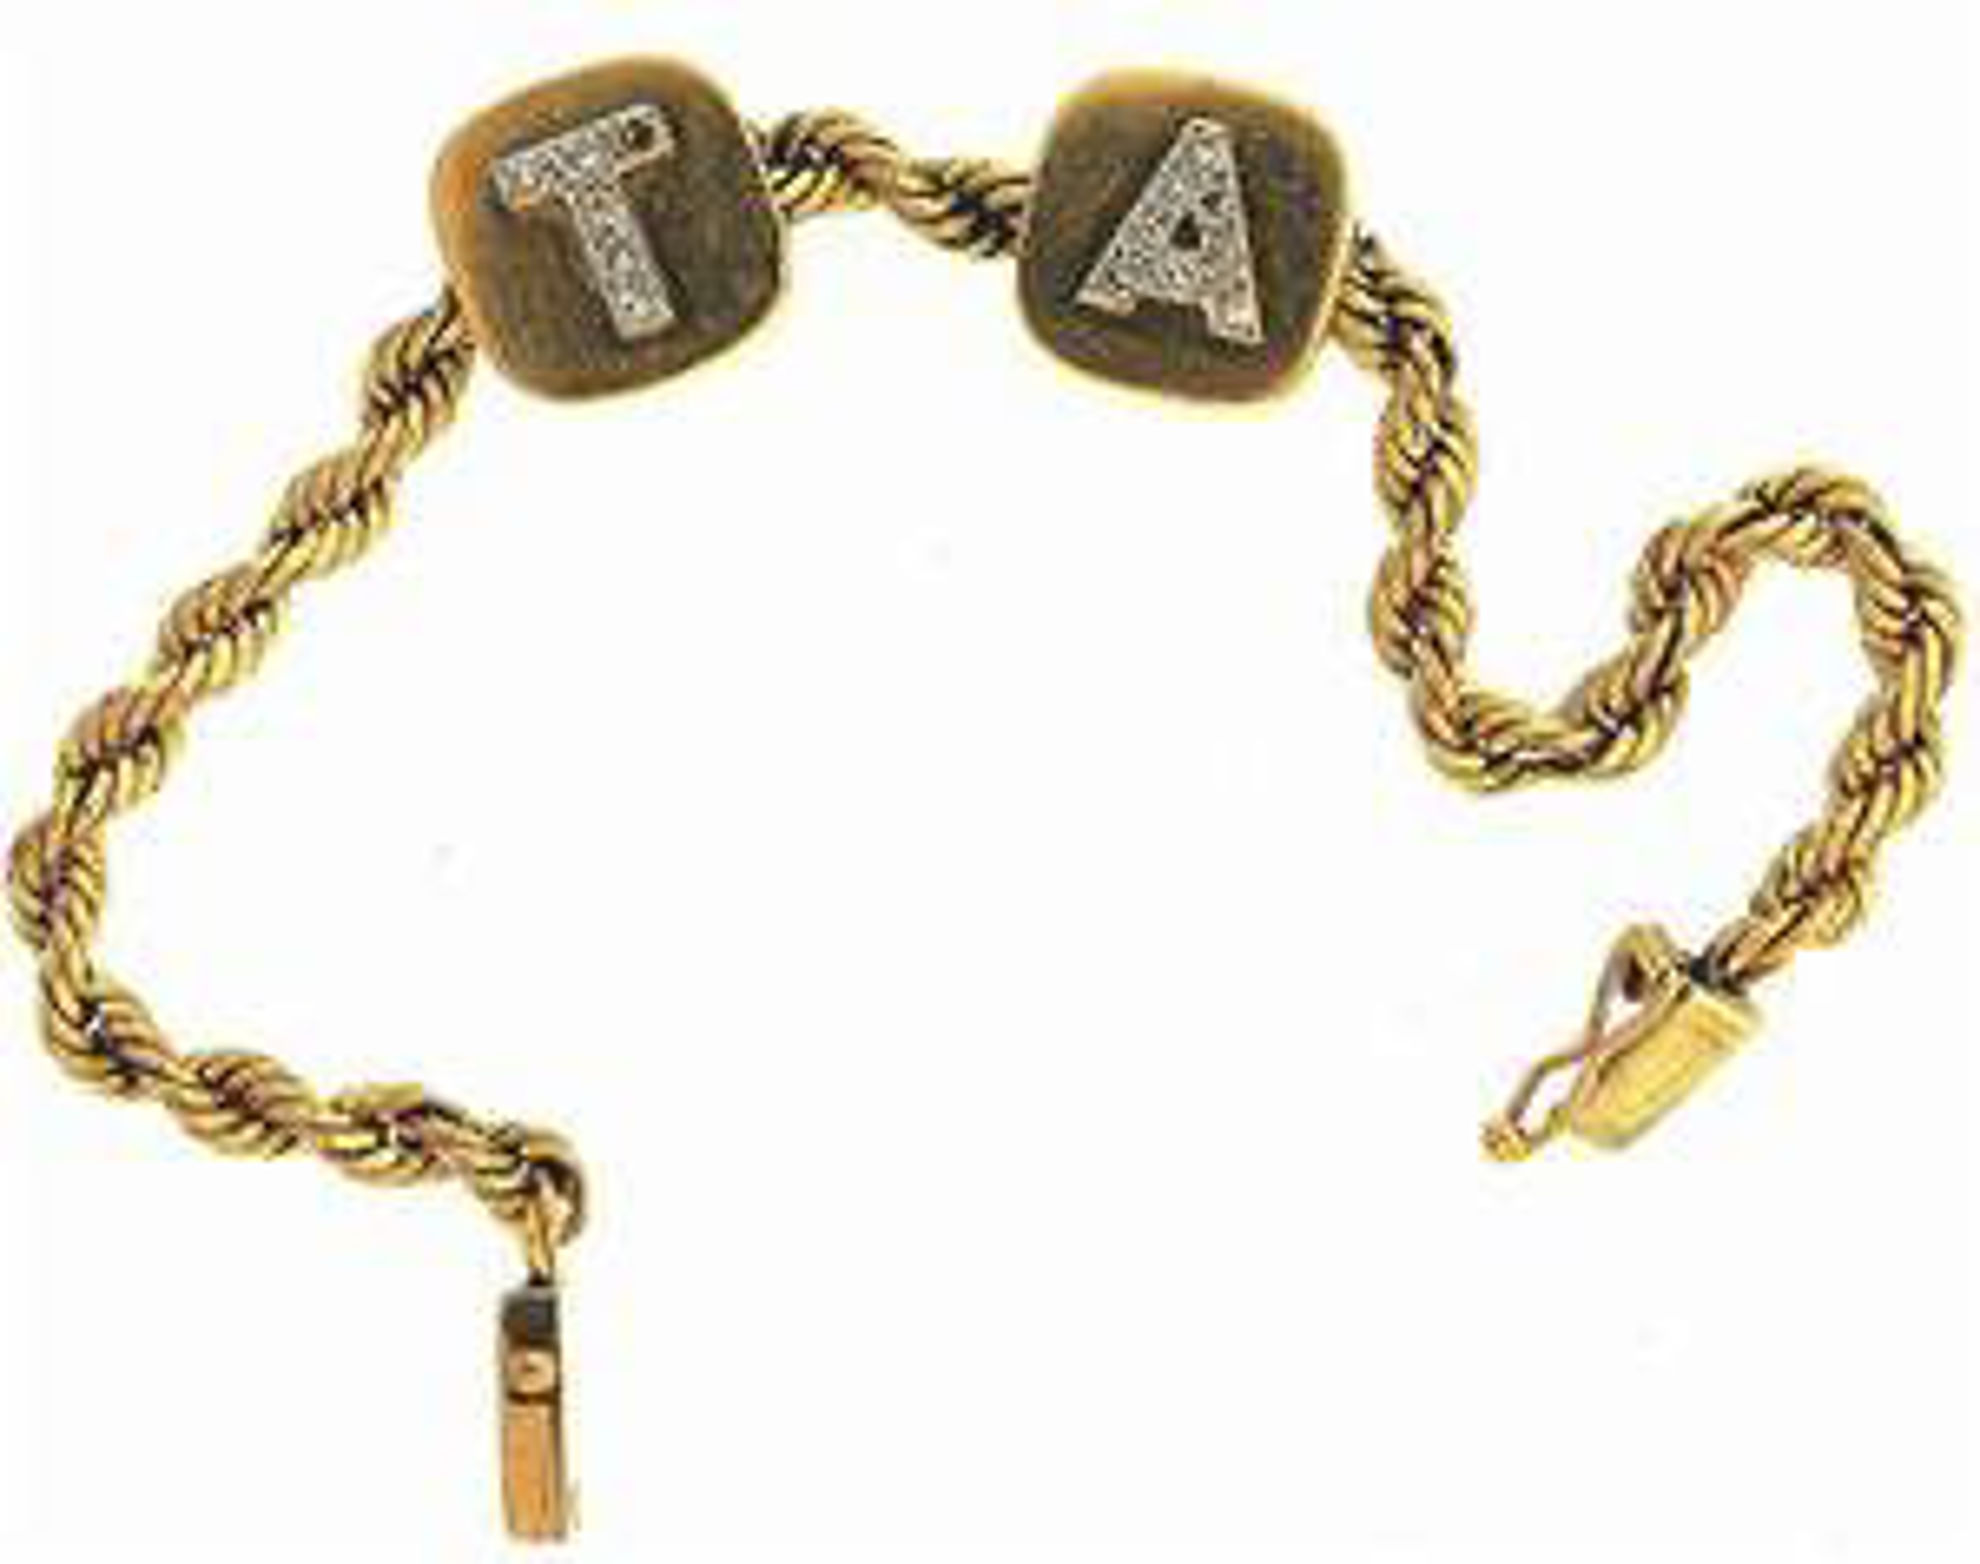 Picture of Bracelets 14kt-16.0 DWT, 24.9 Grams